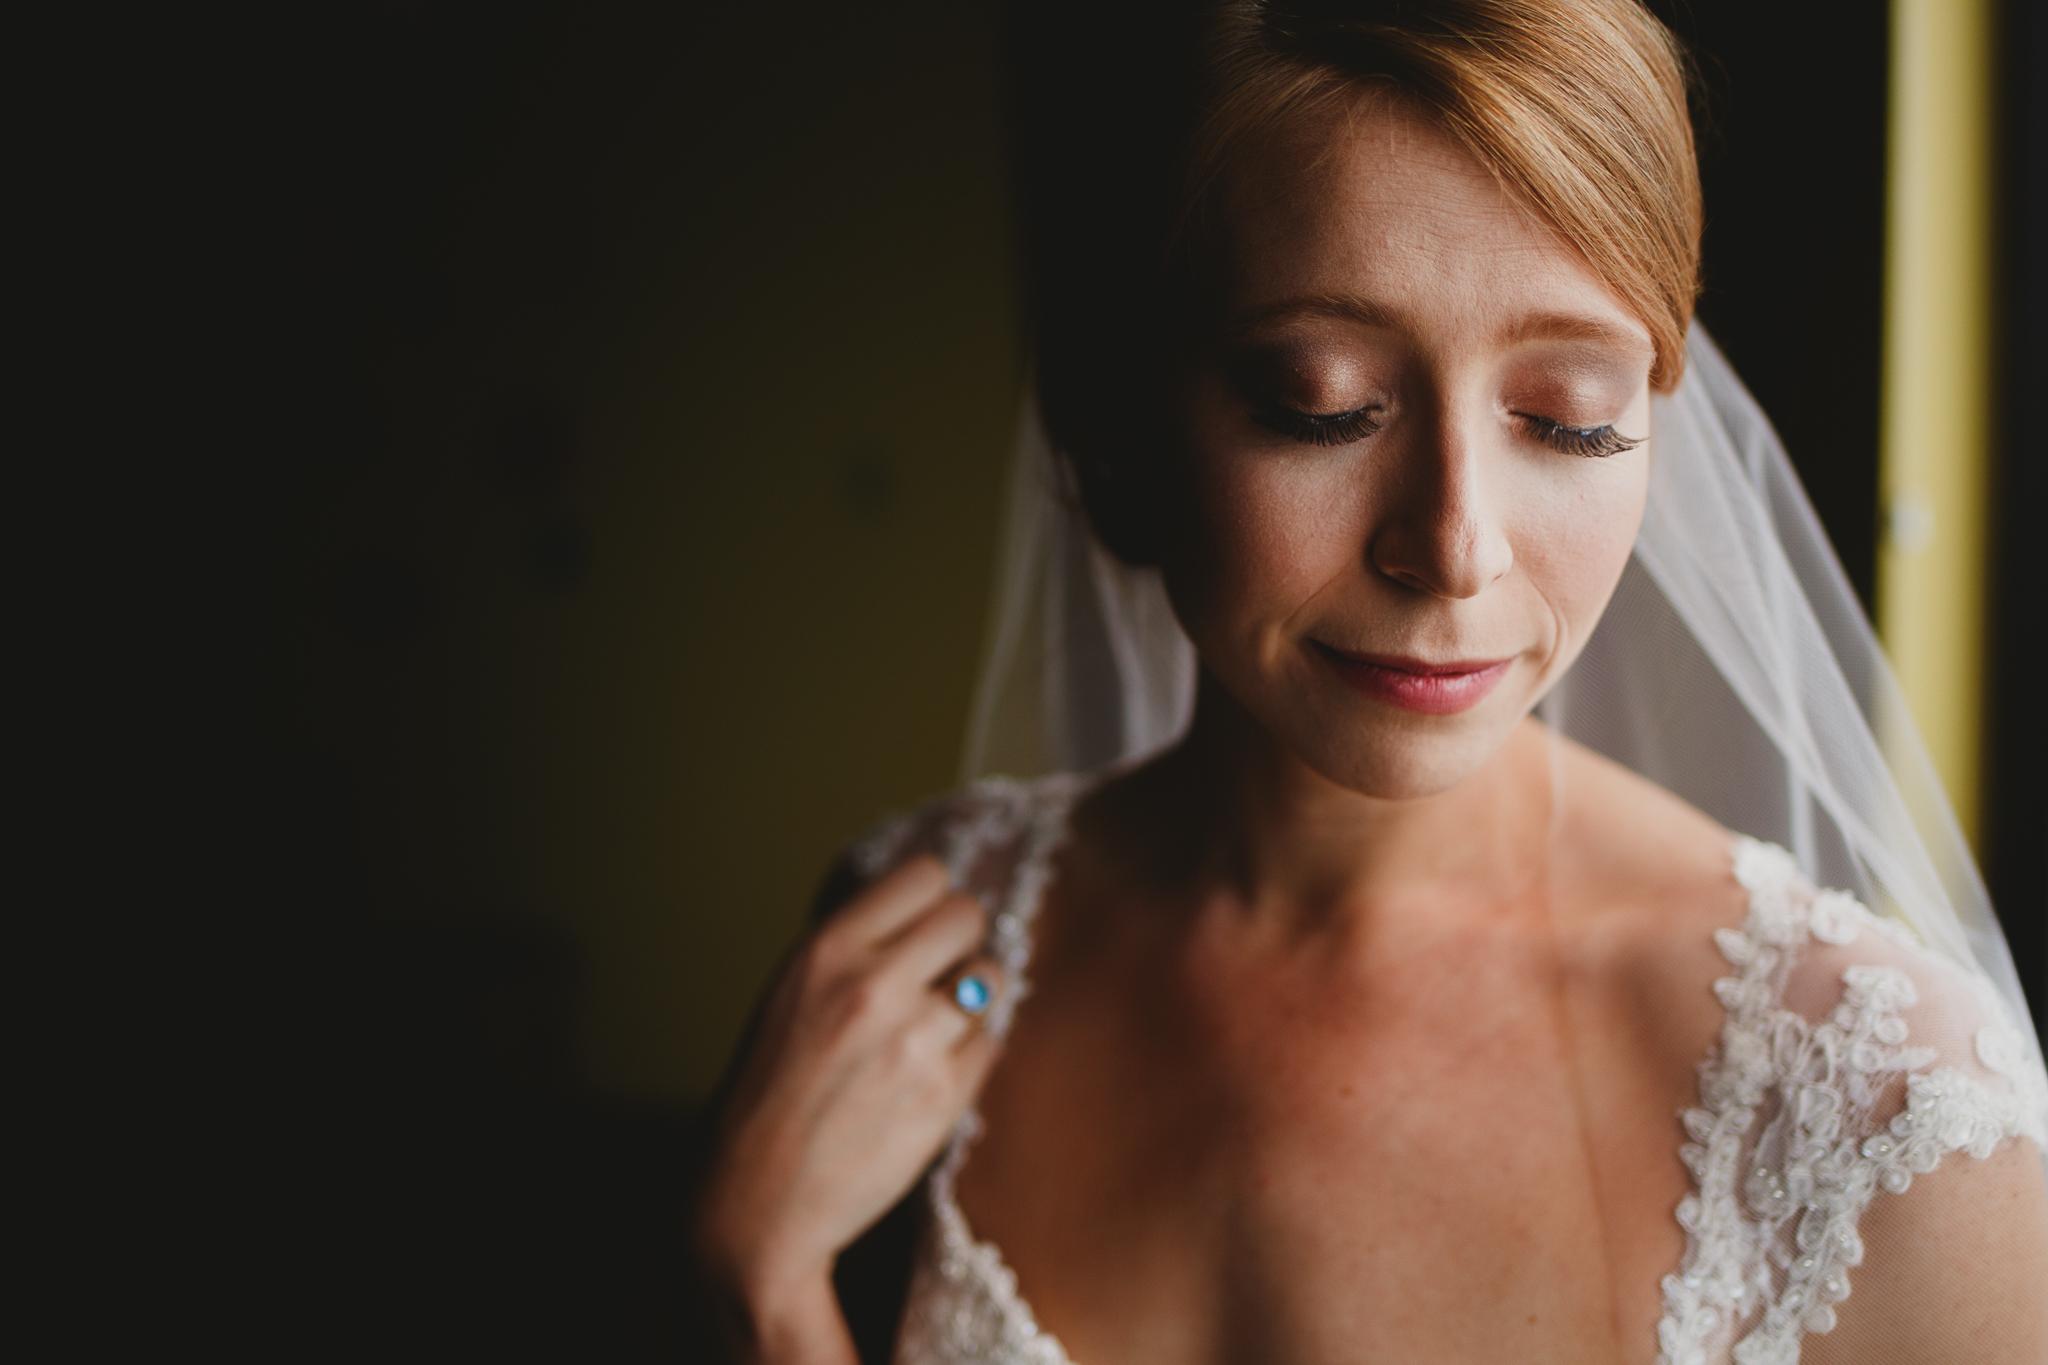 Michael and Kelly - the ashton depot - wedding DFW - wedding photographer- elizalde photography (8 of 150).jpg